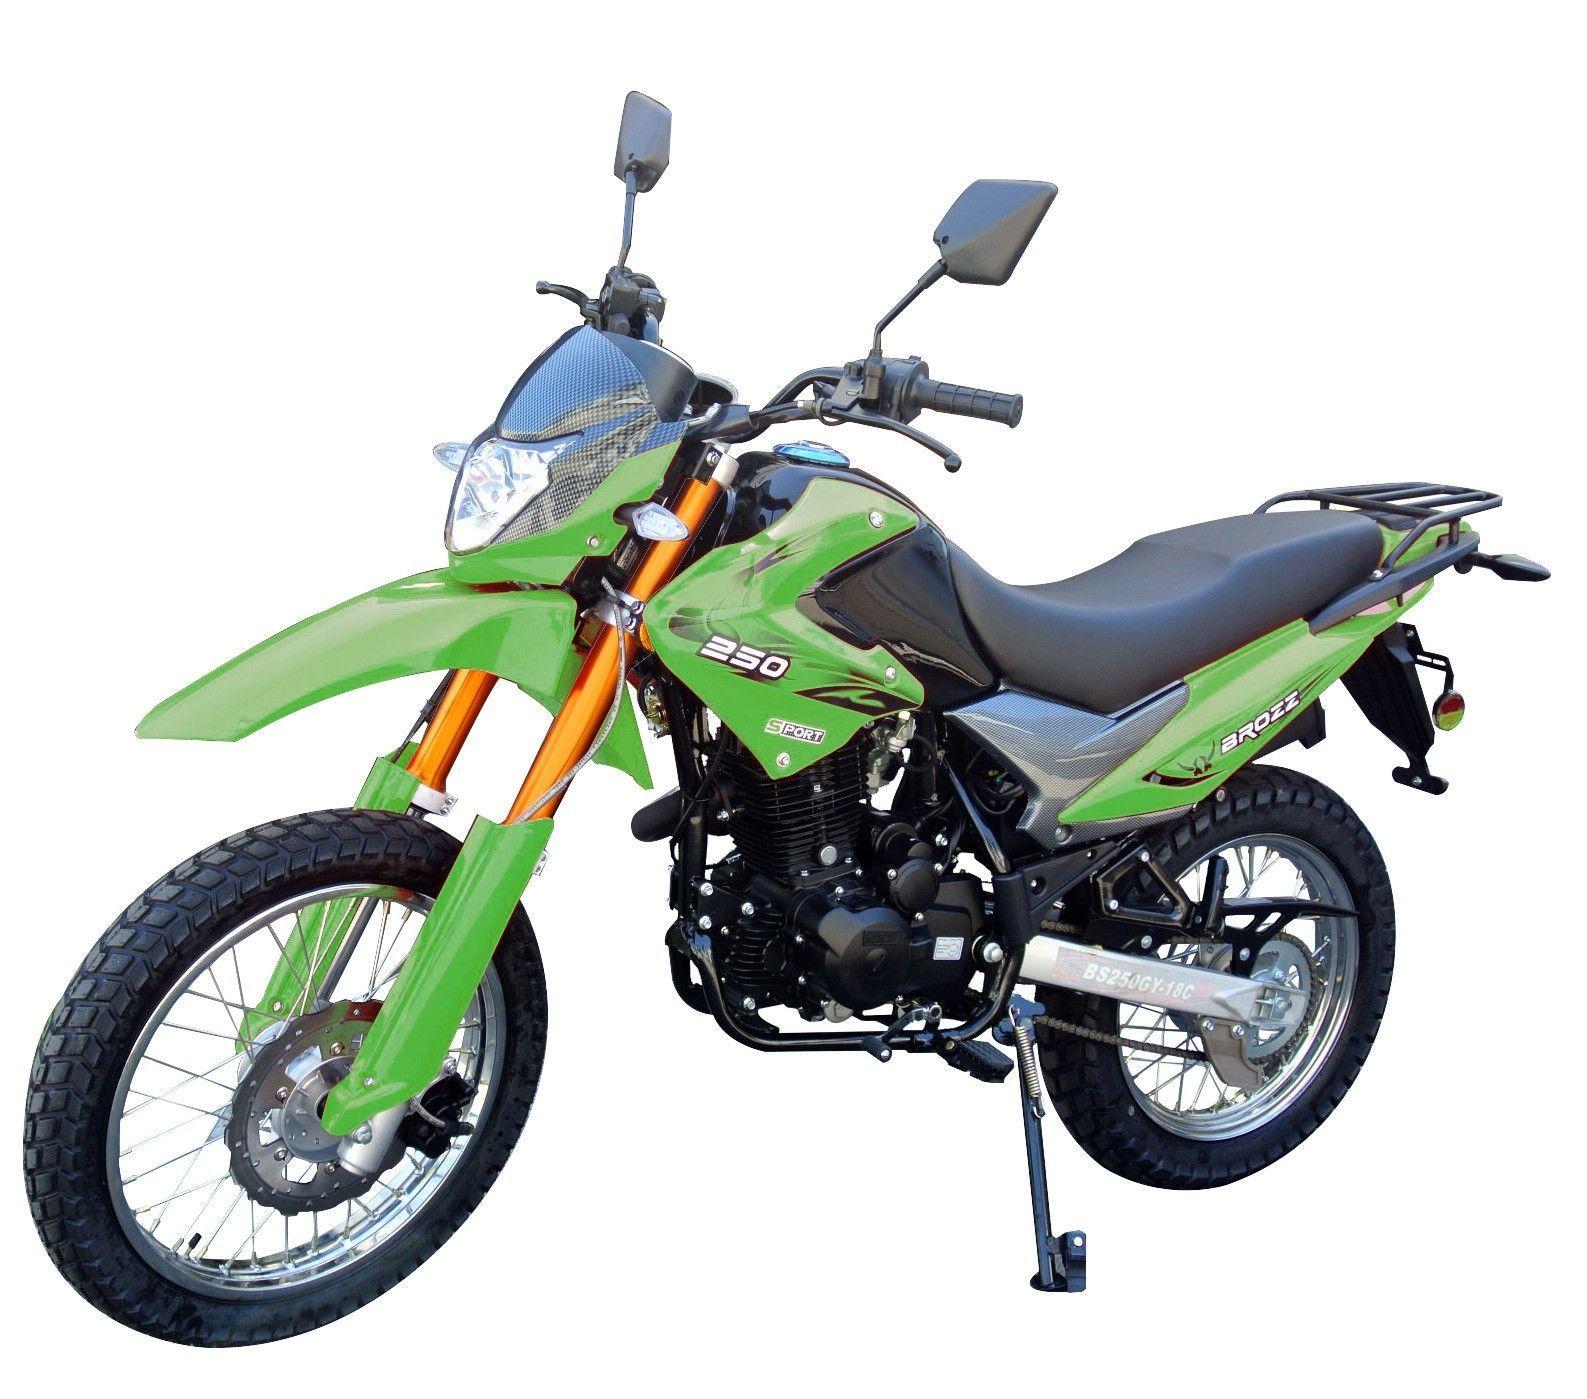 FAST & POWERFUL Enduro Bike 250cc w/Air Cooling Engine 5